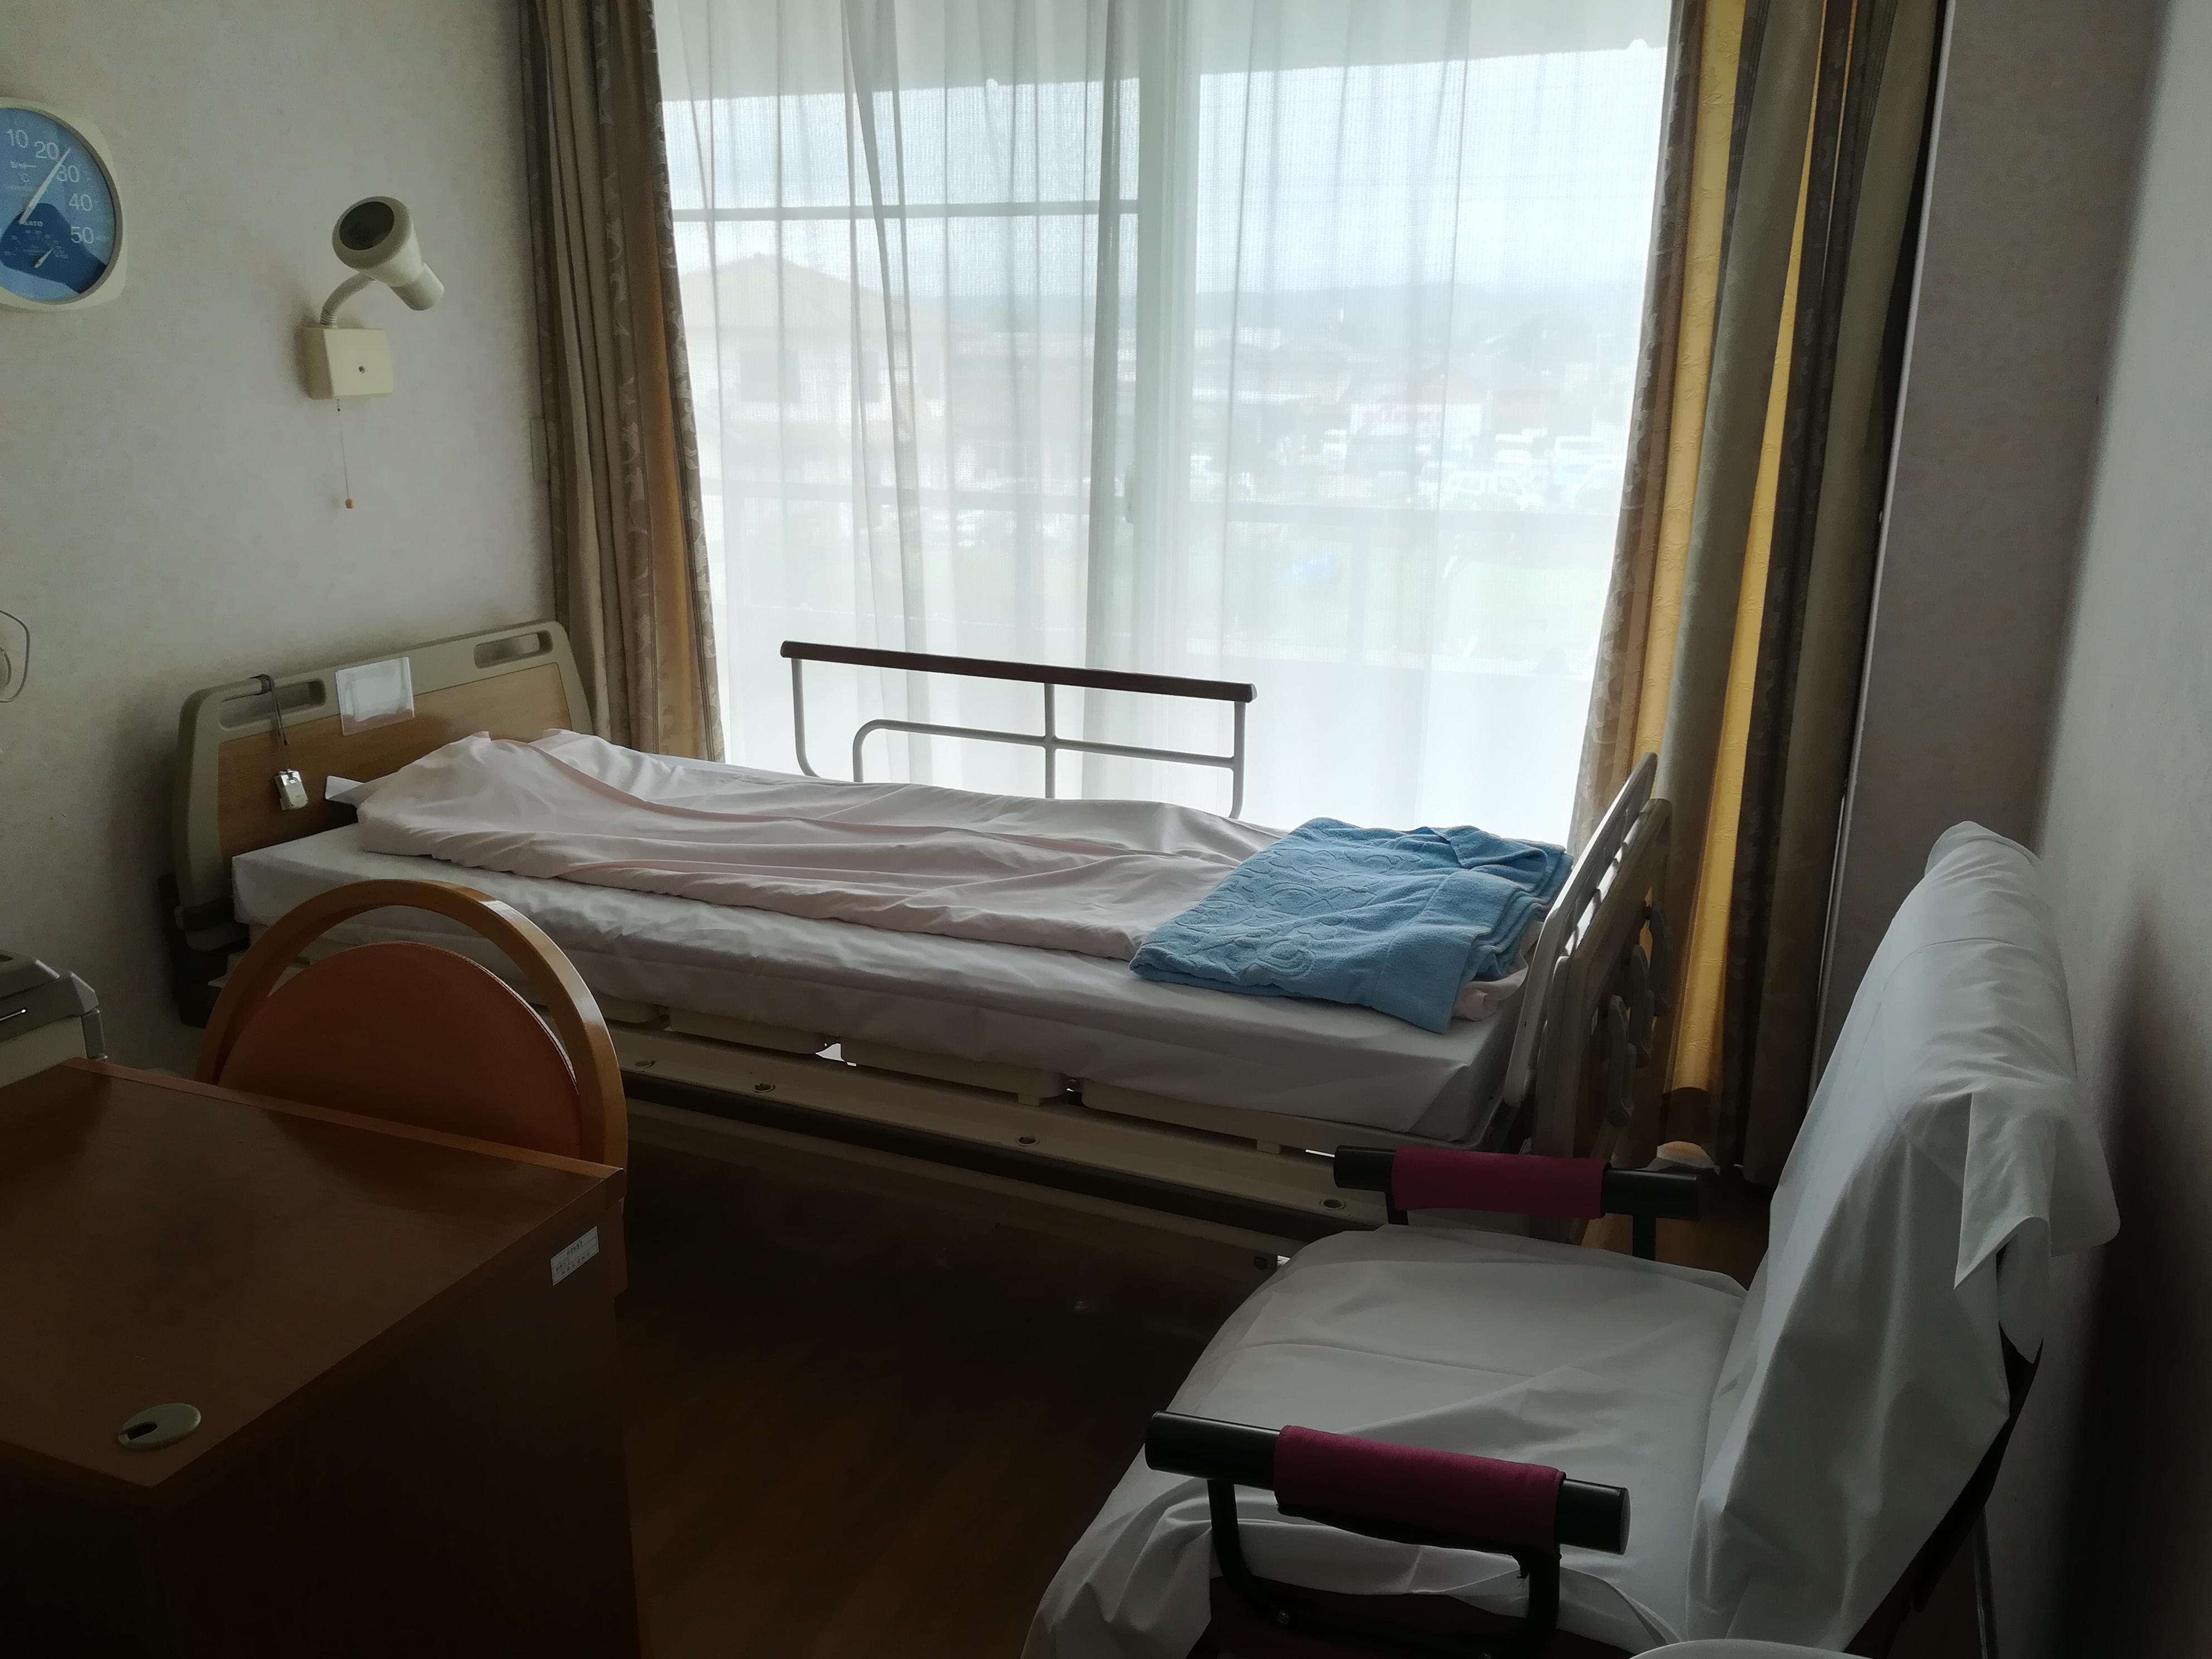 阿蘇温泉病院の産婦人科の個室